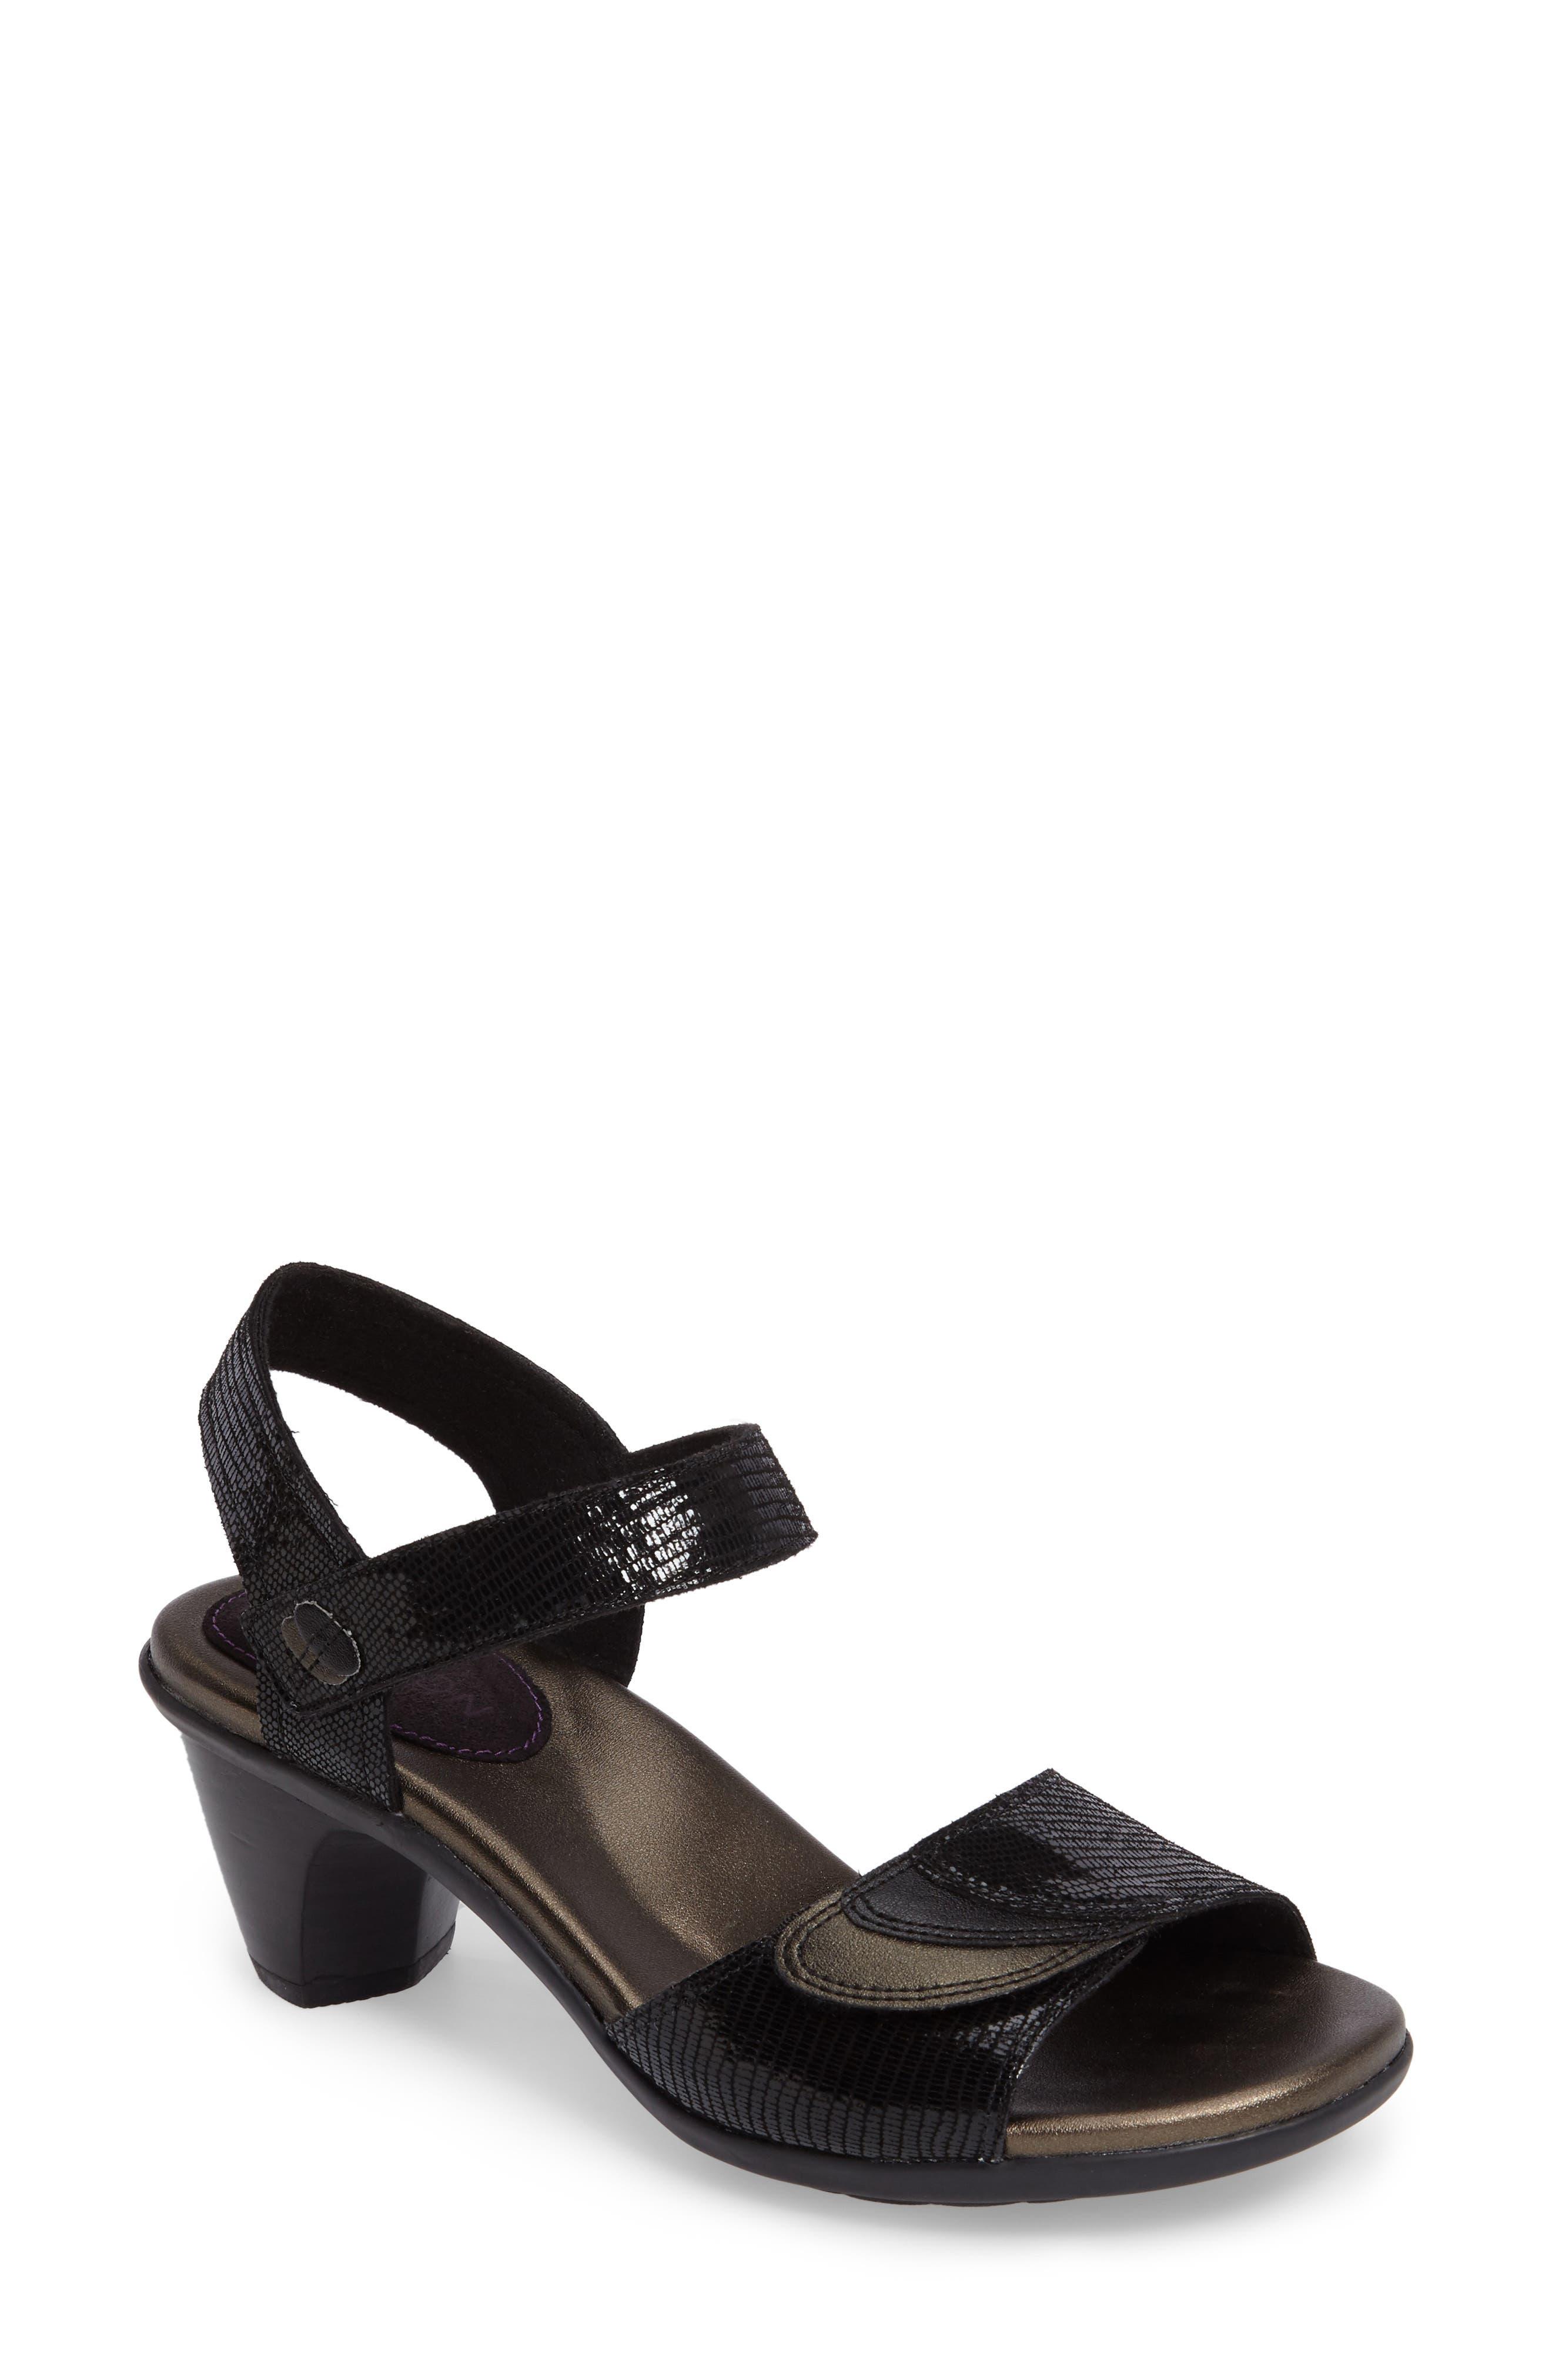 Medici Sandal,                             Main thumbnail 1, color,                             BLACK FABRIC